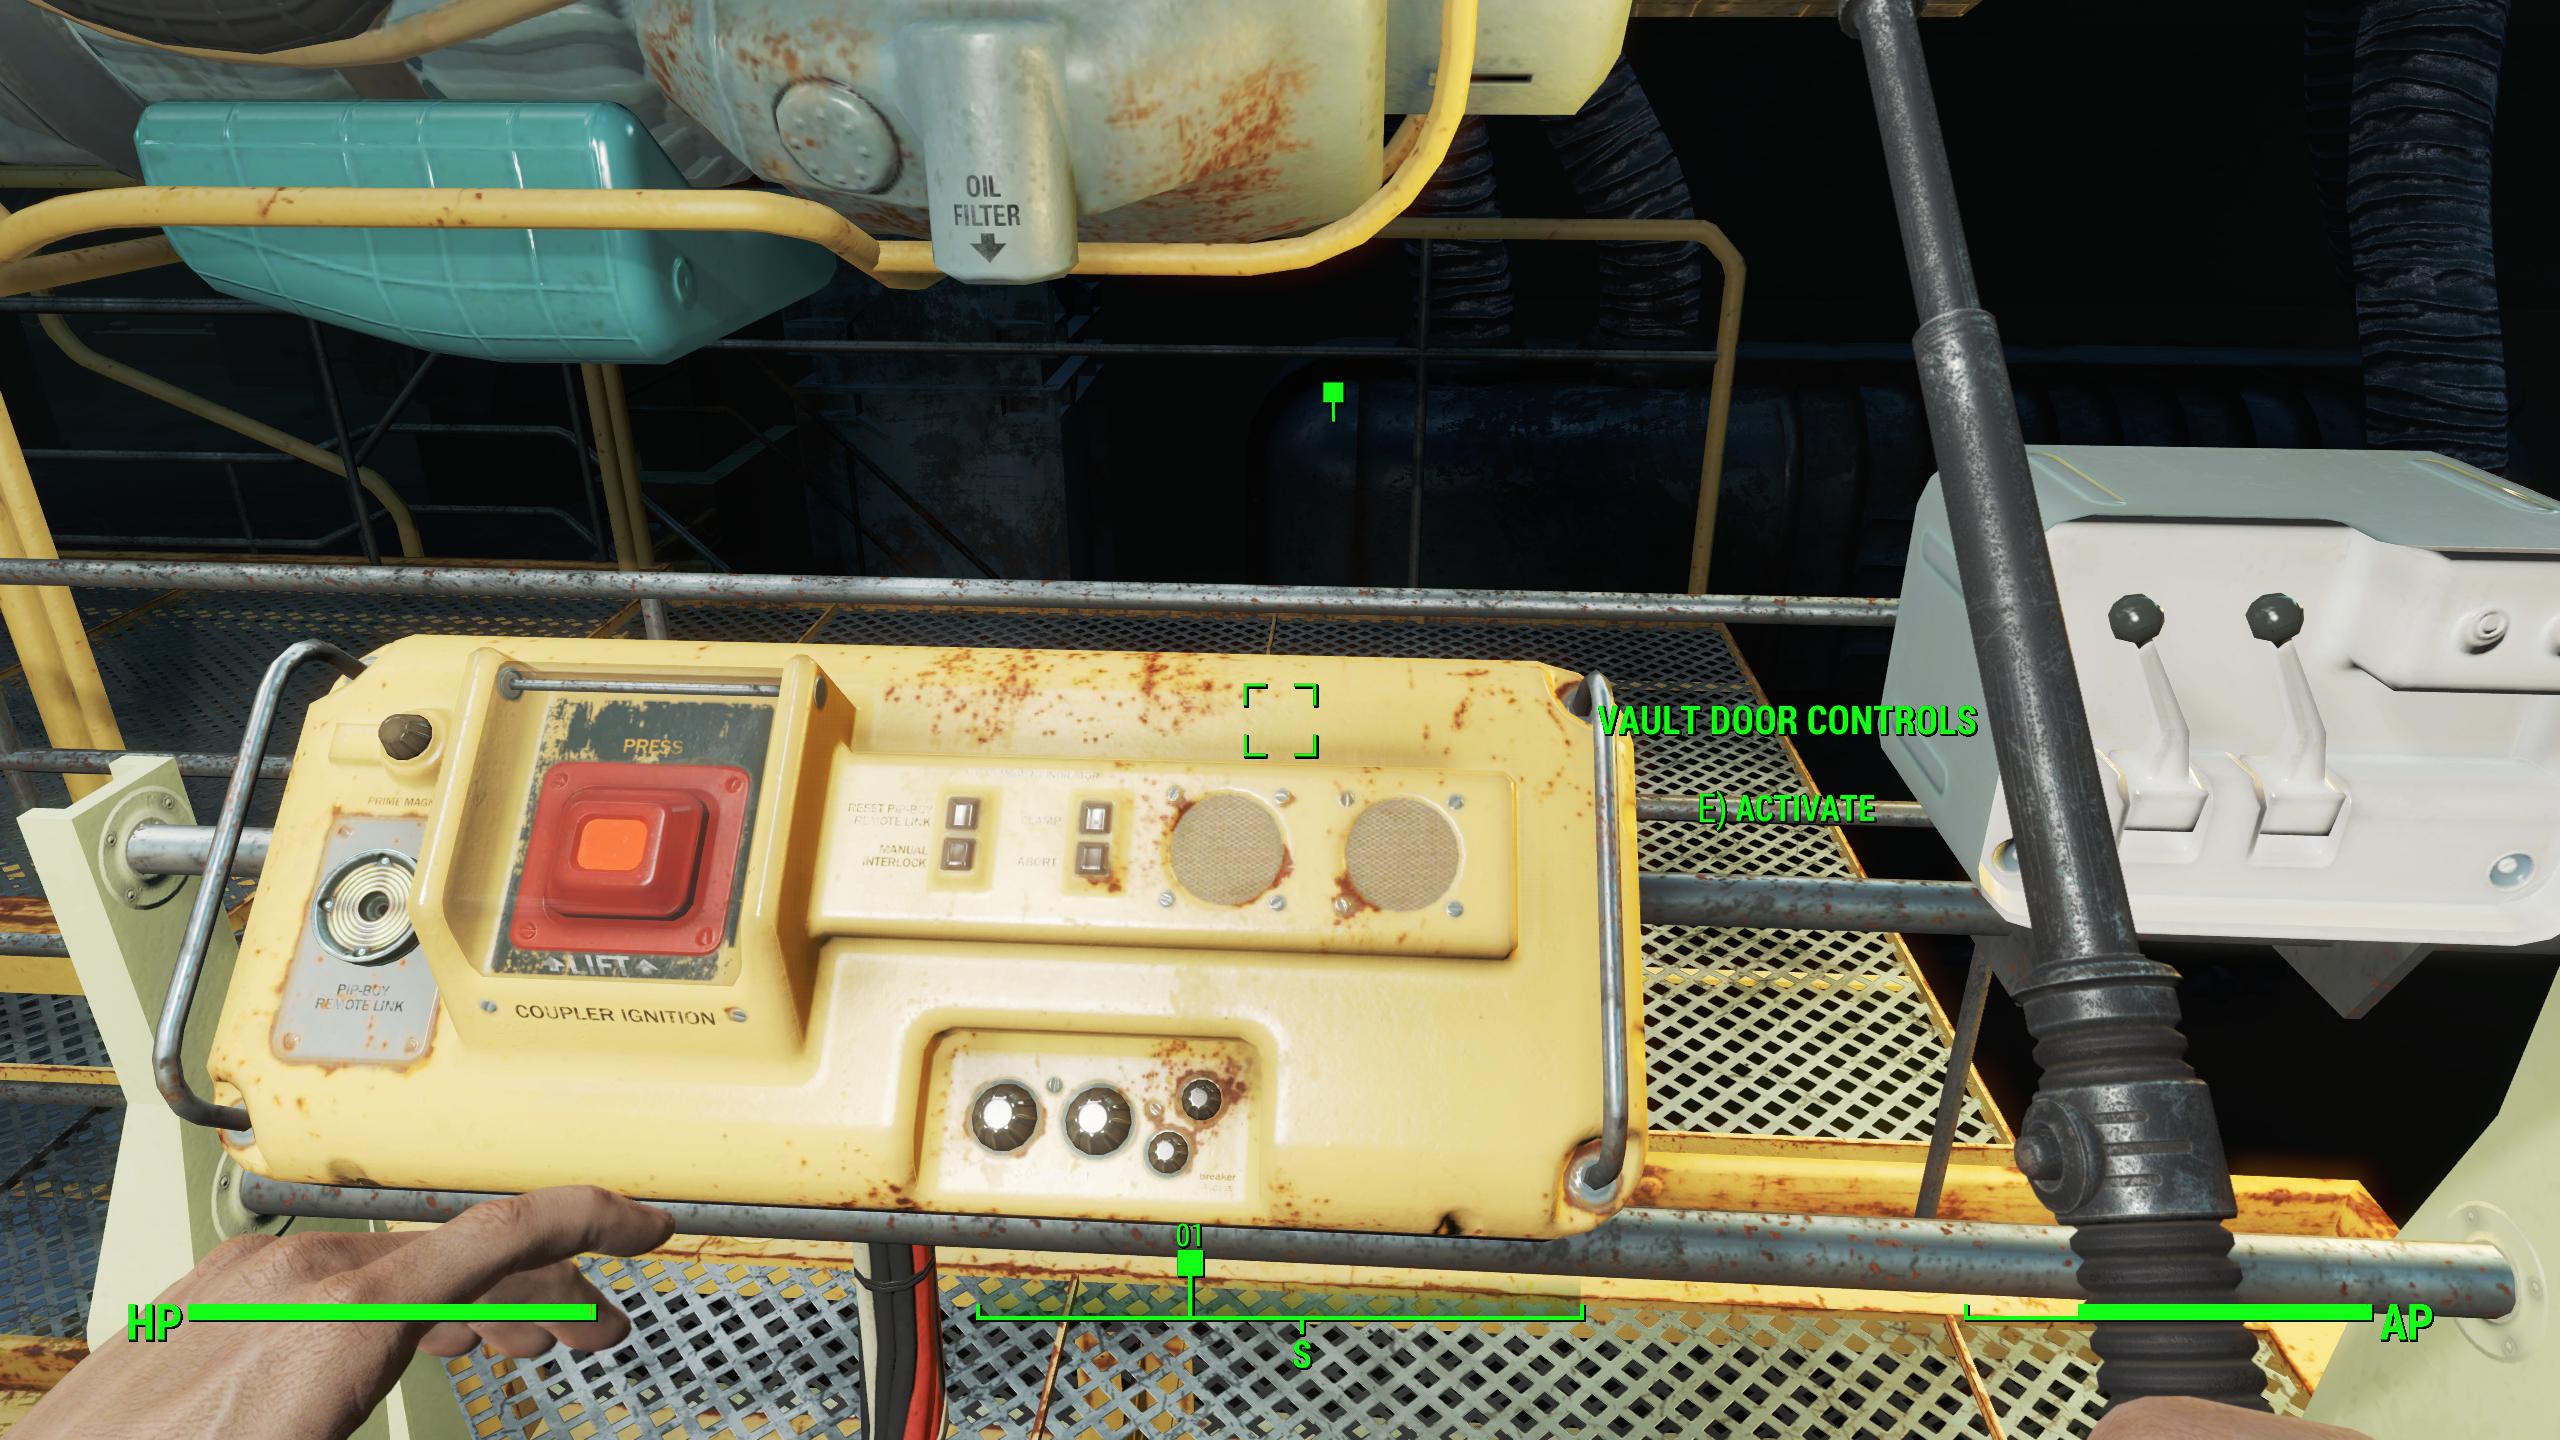 Fallout 4 Full screen · Issue #412 · Codeusa/Borderless-Gaming · GitHub